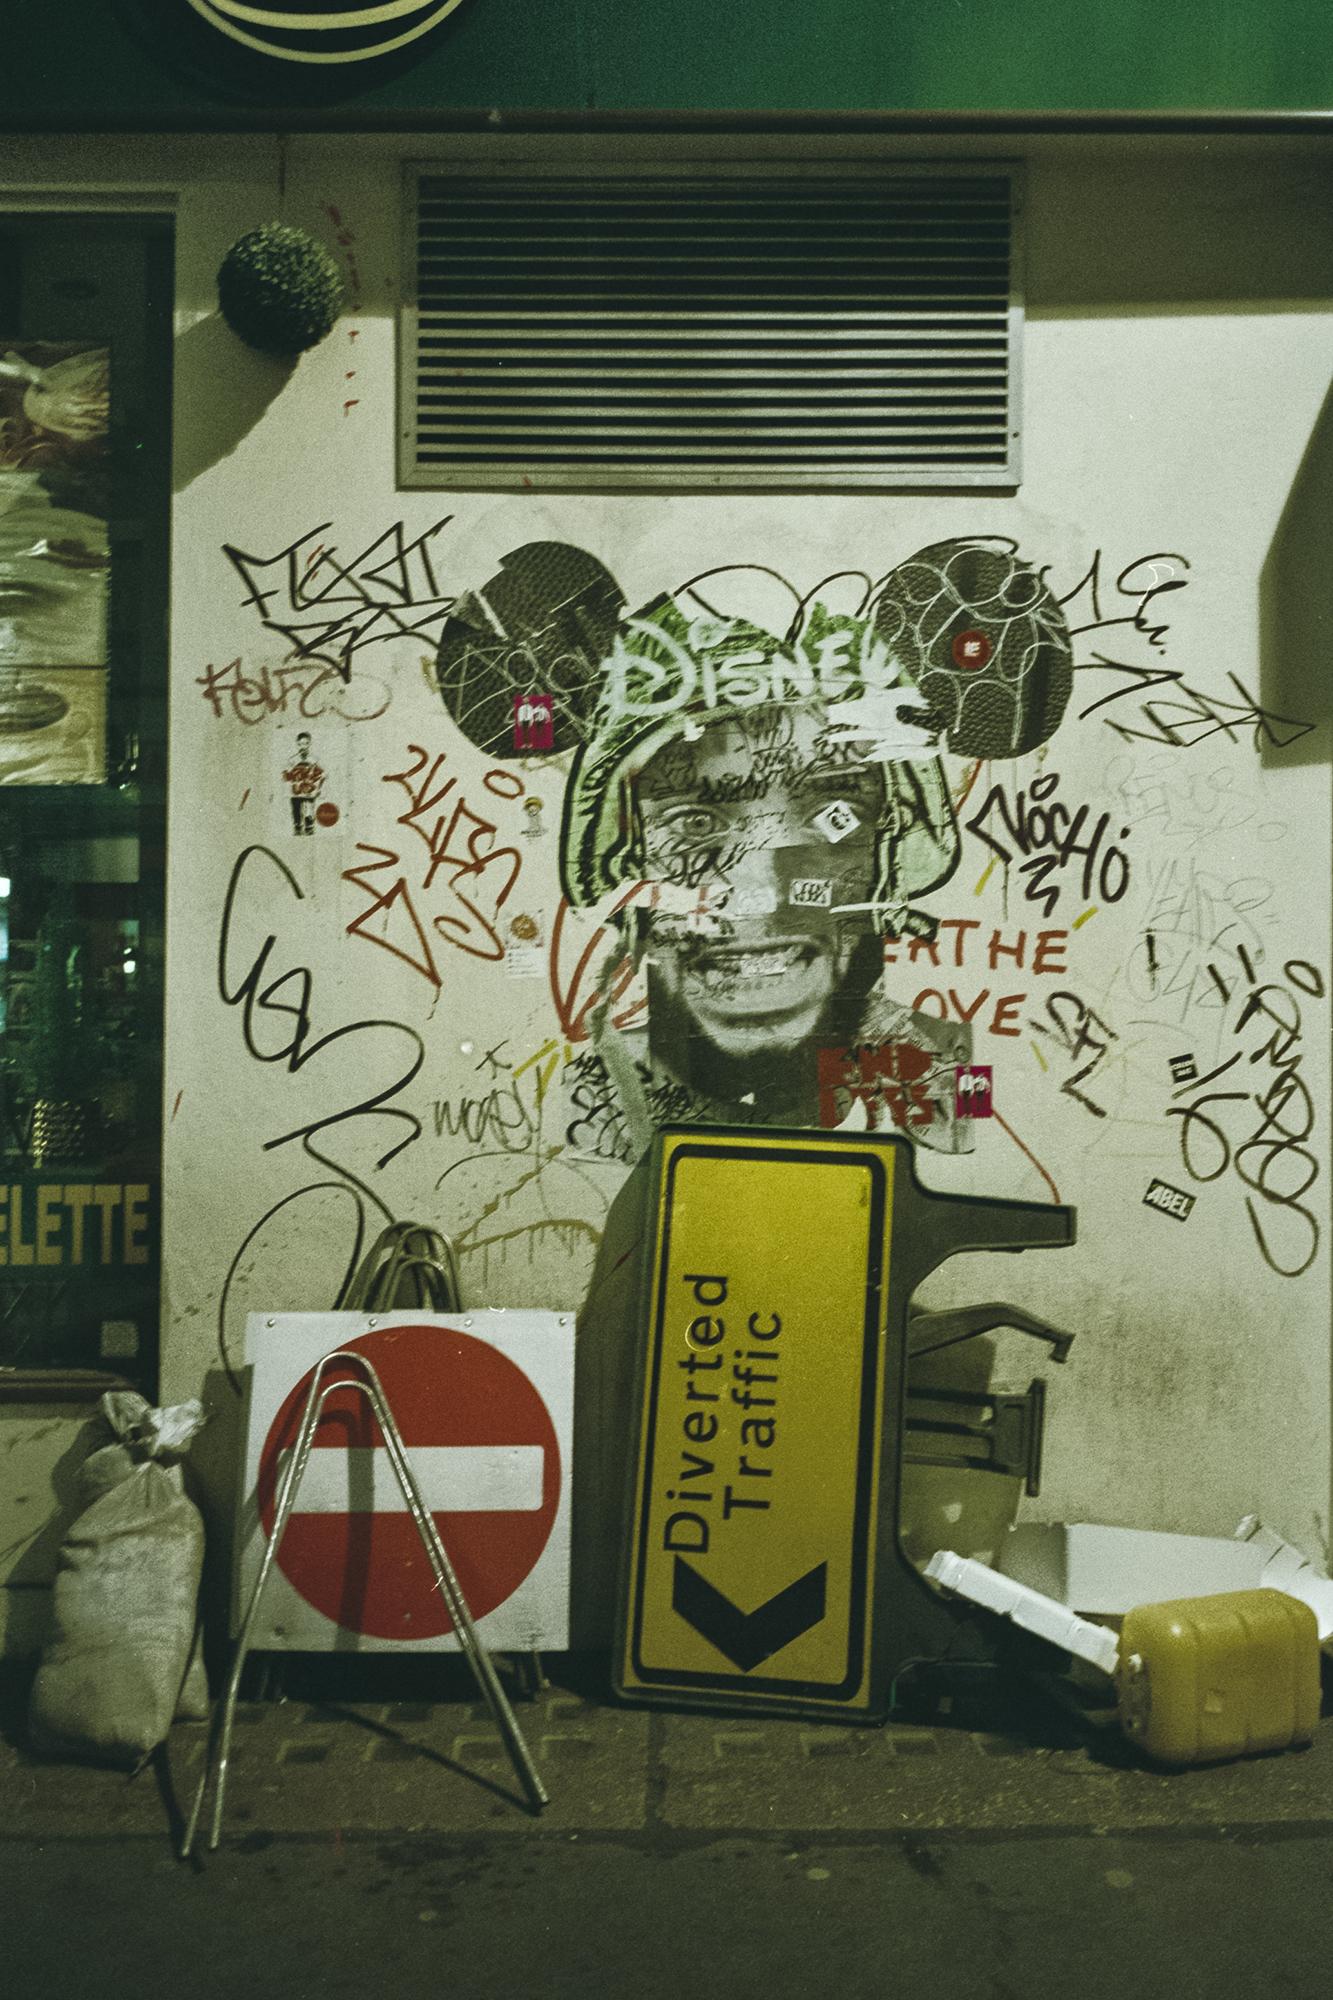 Oscar-arribas-photography-fotografo-portrait-retrato-editorial-london-street-photography-urbana-londres-film-analog-35mm-night-nocturna-59.jpg